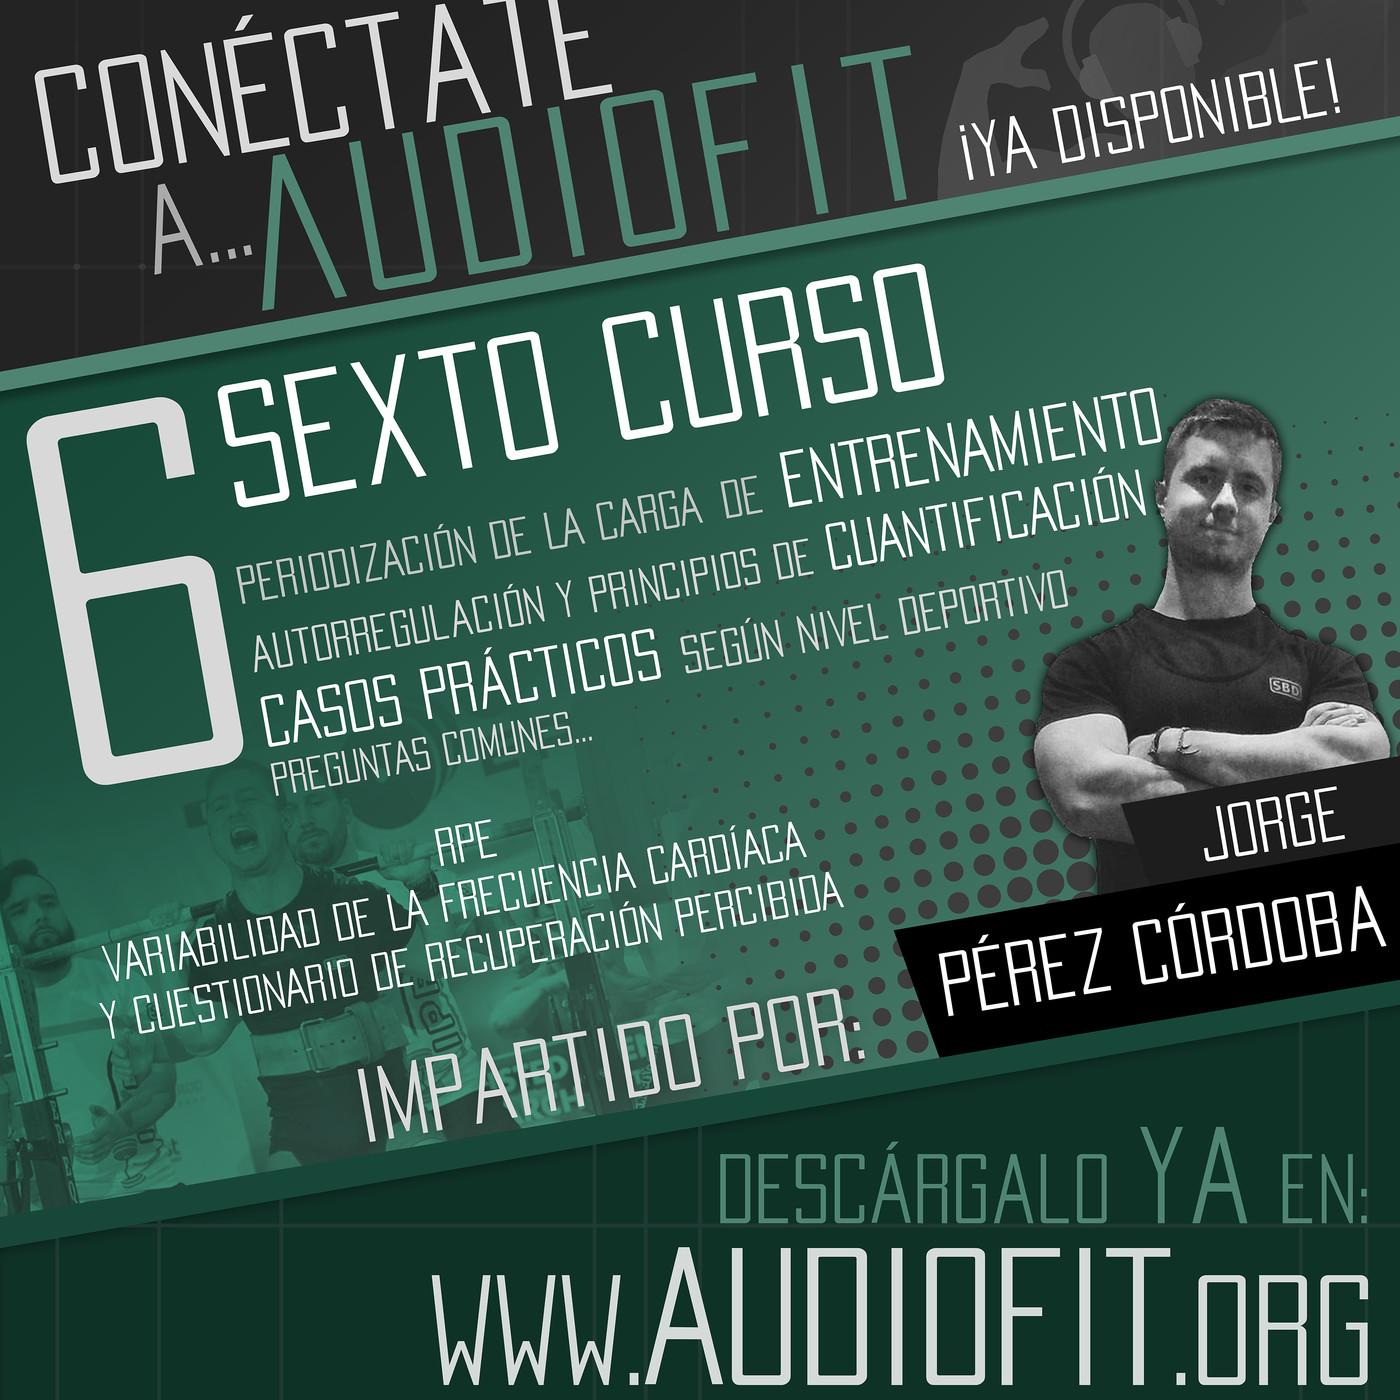 Jorge Pérez Córdoba responde - RPE y Definición